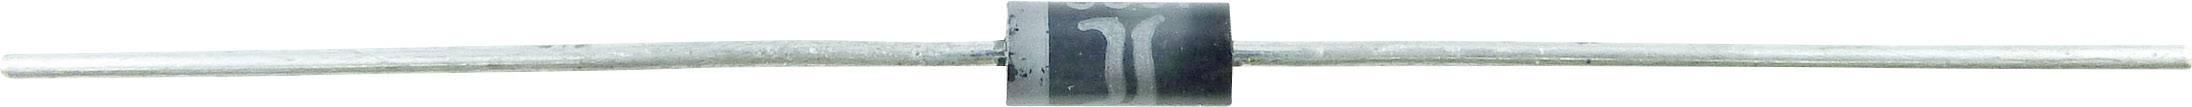 TVS dioda Diotec P6KE15CA, U(Db) 14,3 V, U(B) 12 V, I(PP) 28 A